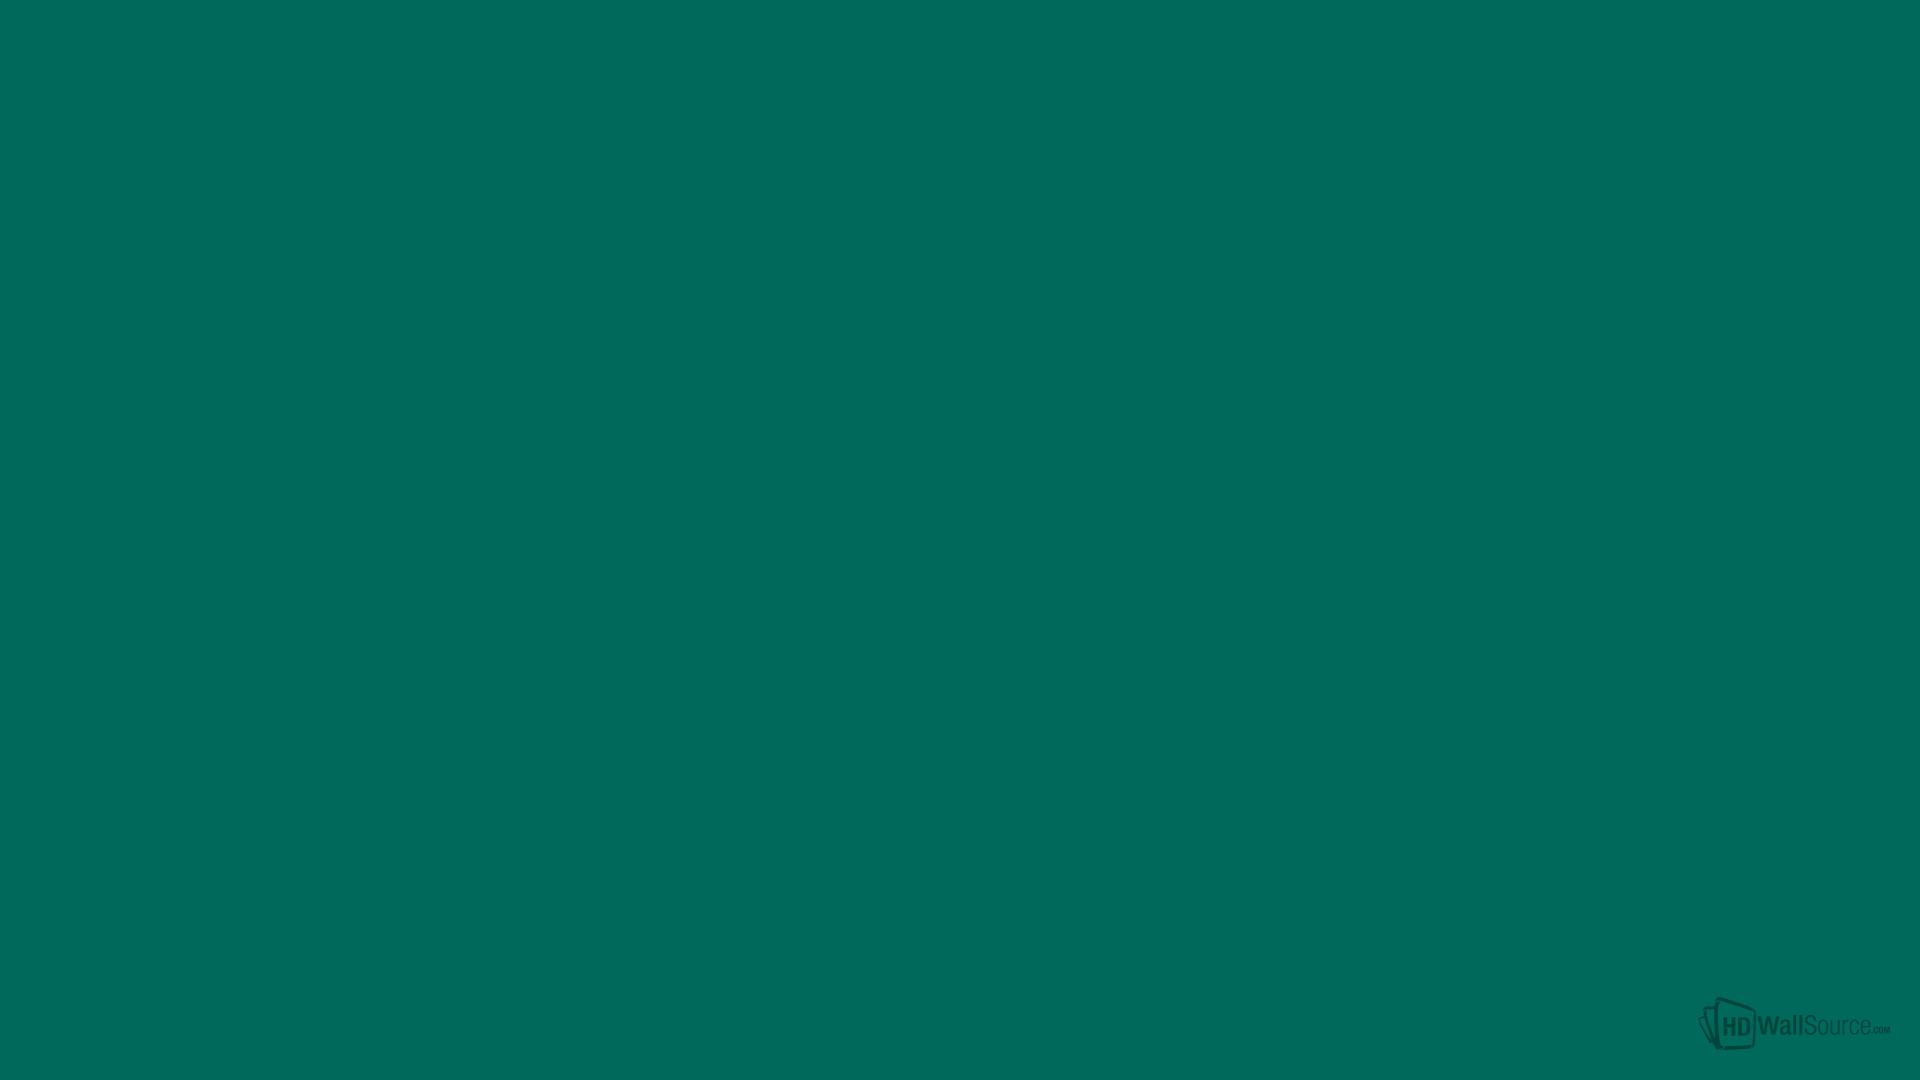 00695c wallpaper 70560